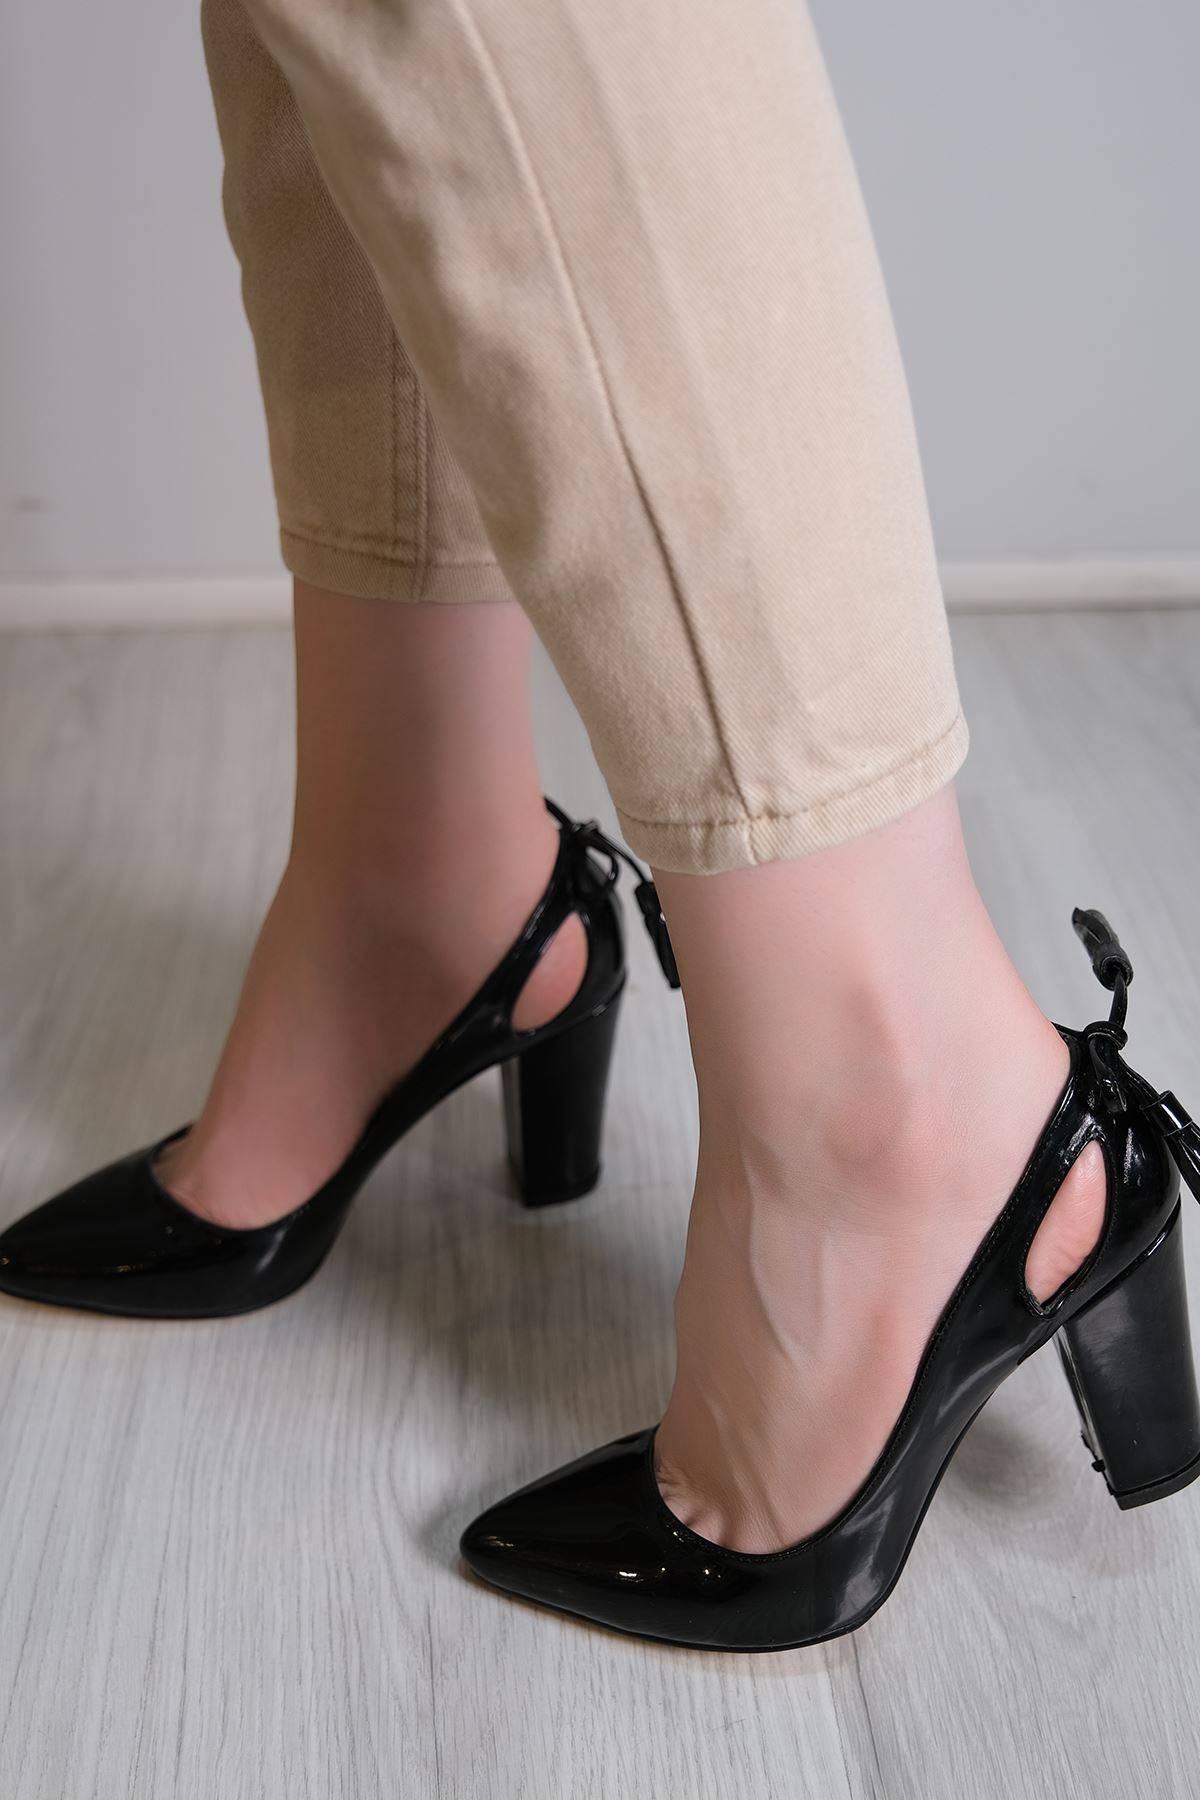 9 Cm Topuklu Ayakkabı Siyahrugan - 6106.264.